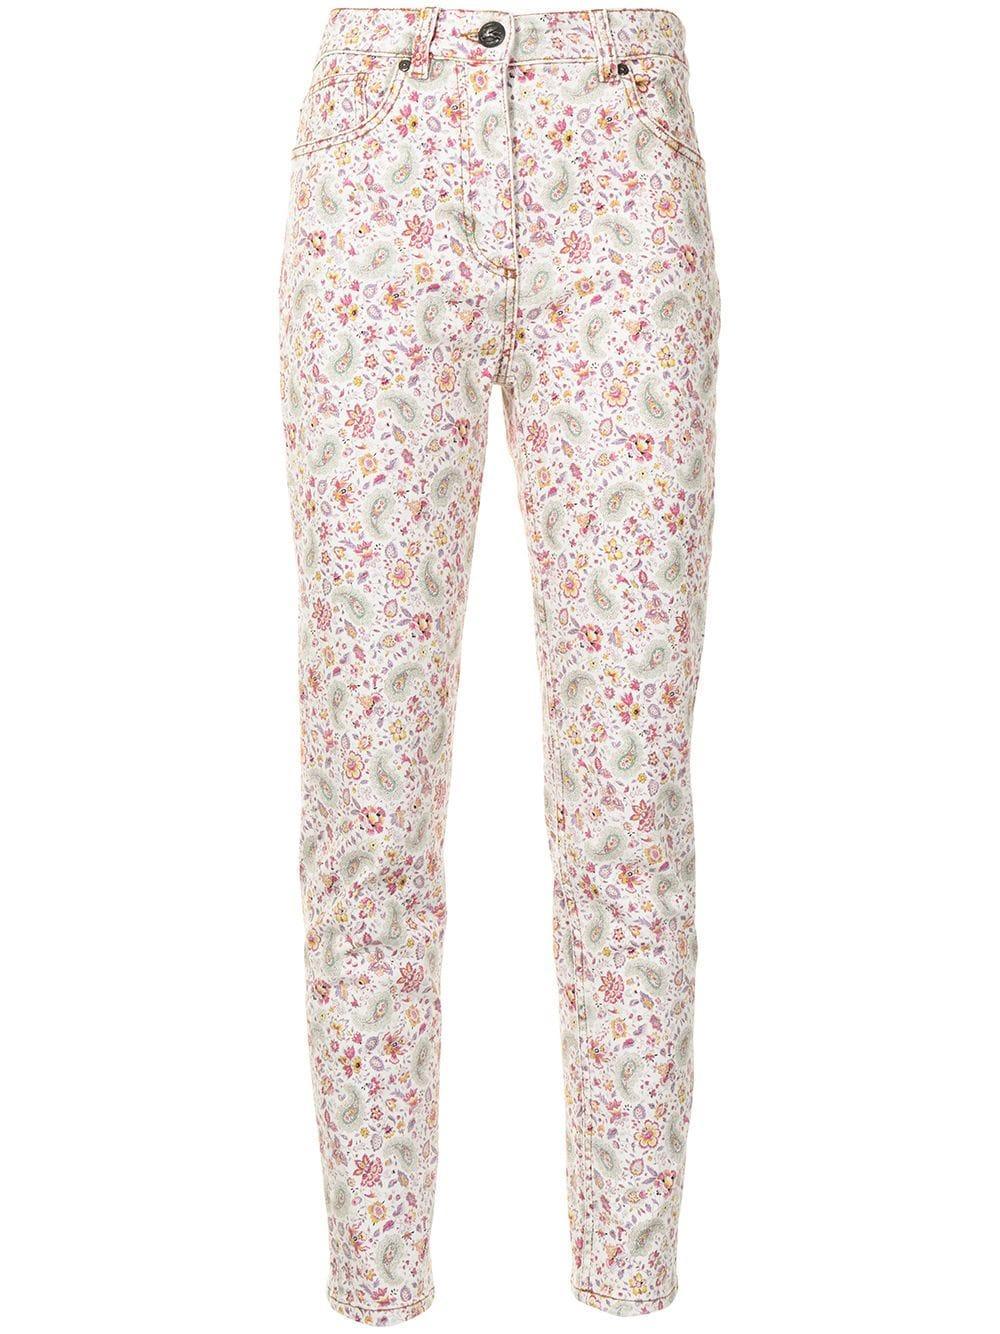 Small Paisley Skinny Jean Item # 211D144539455